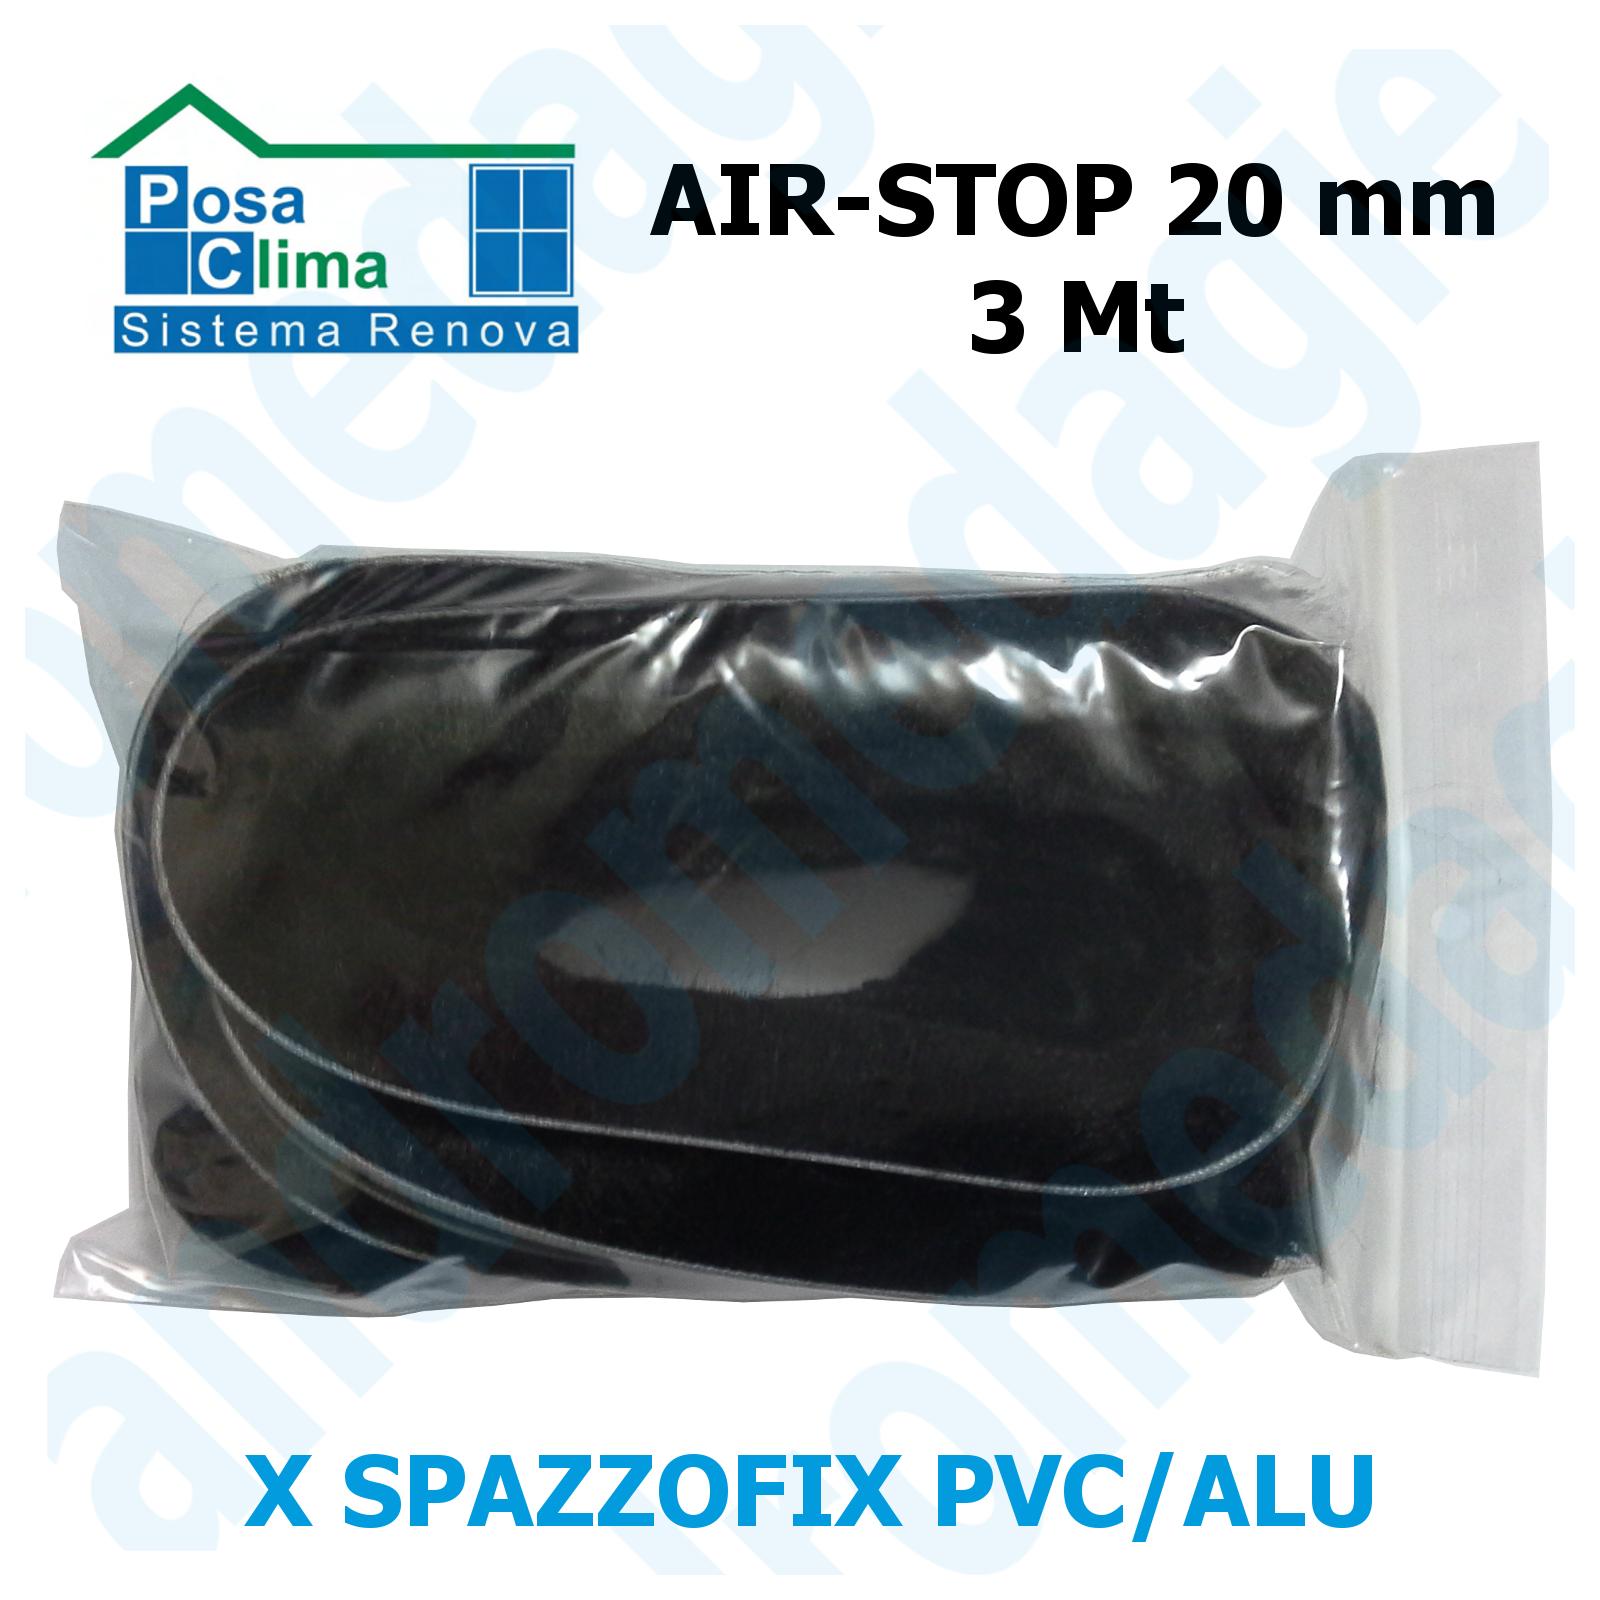 AIR-STOP 20MMx3MT